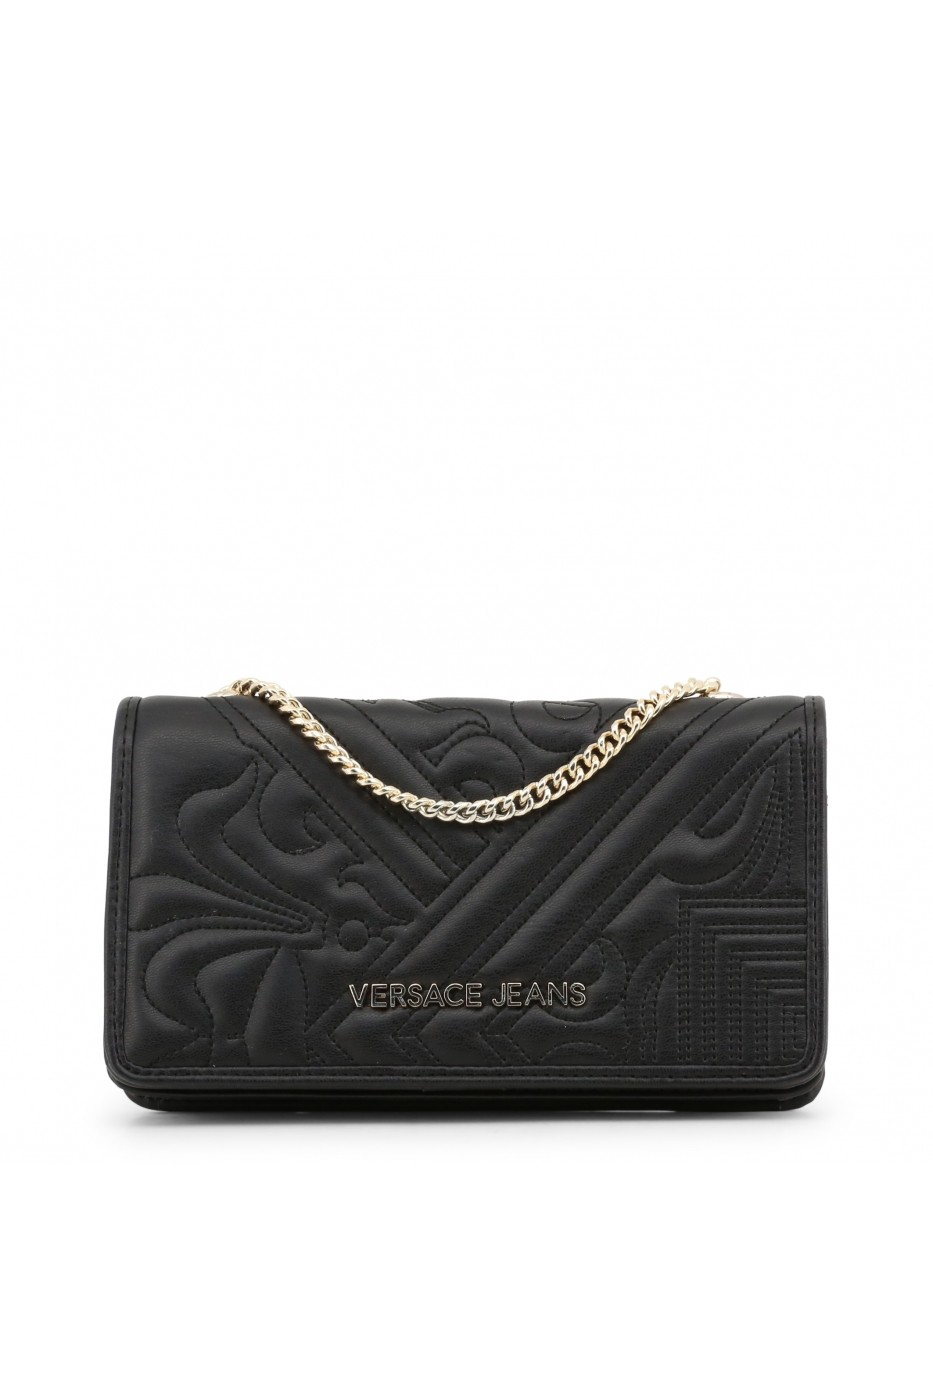 86688853118f Versace Jeans Borítéktáska E3VSBPZ3_70792_899 - FashionUP!